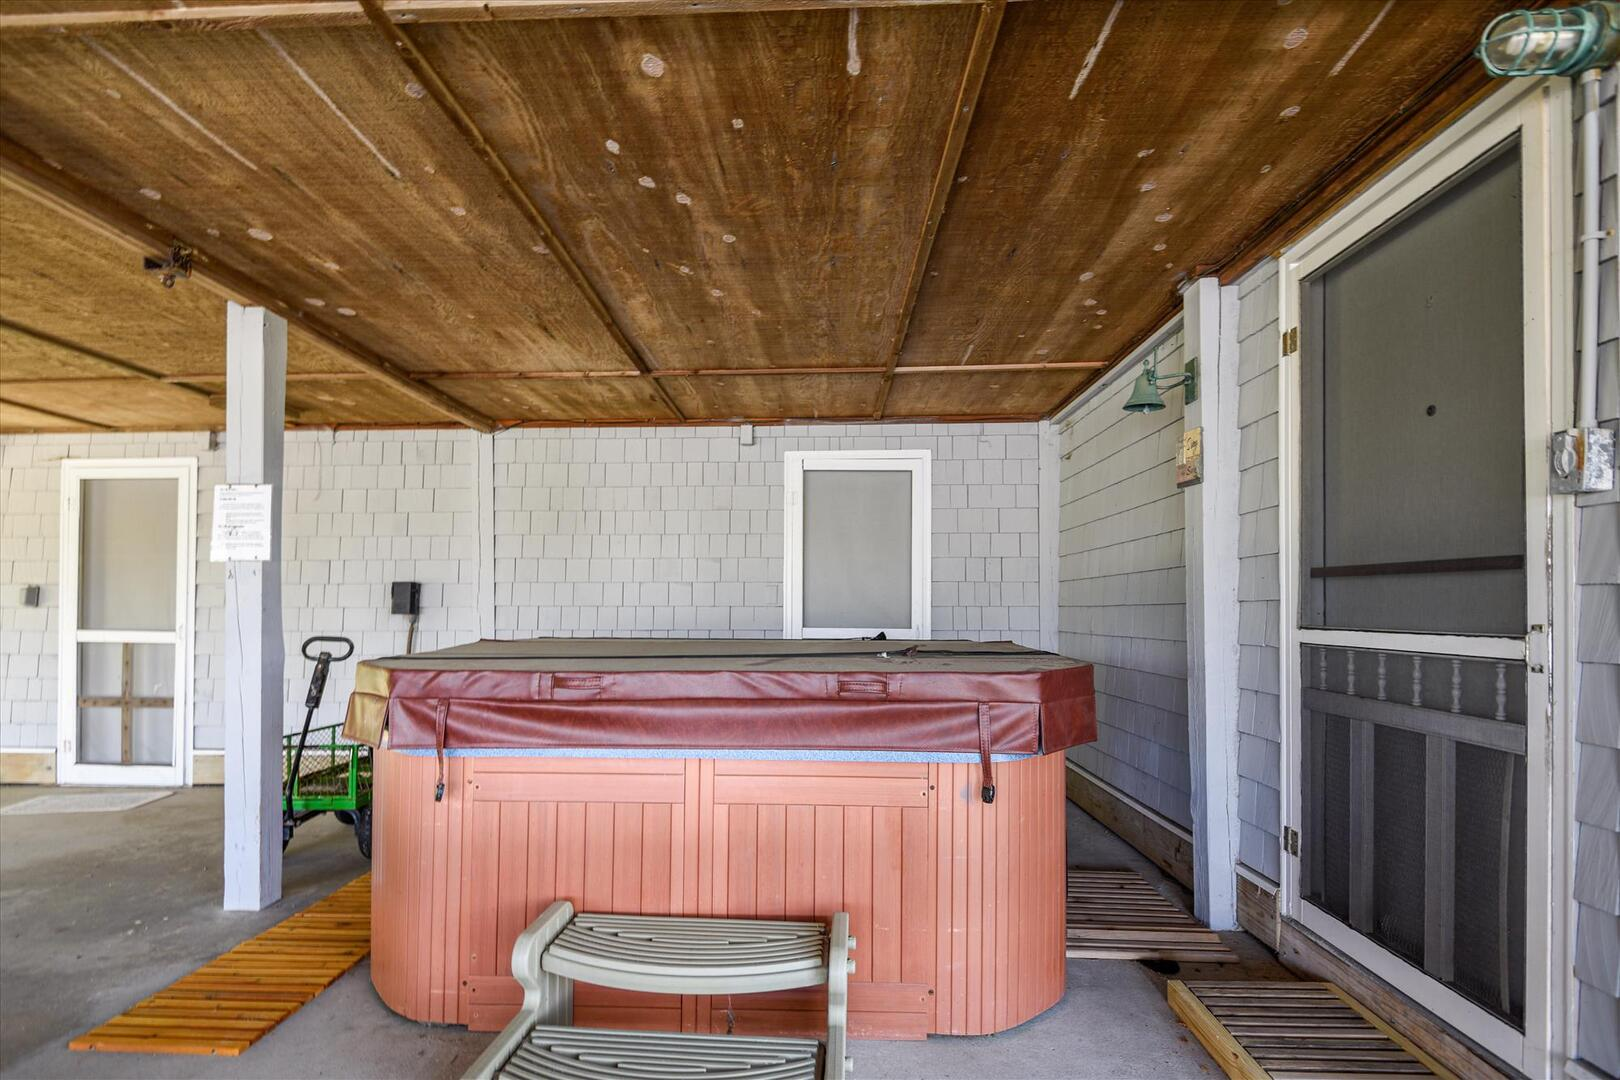 Lower Level,Hot Tub,